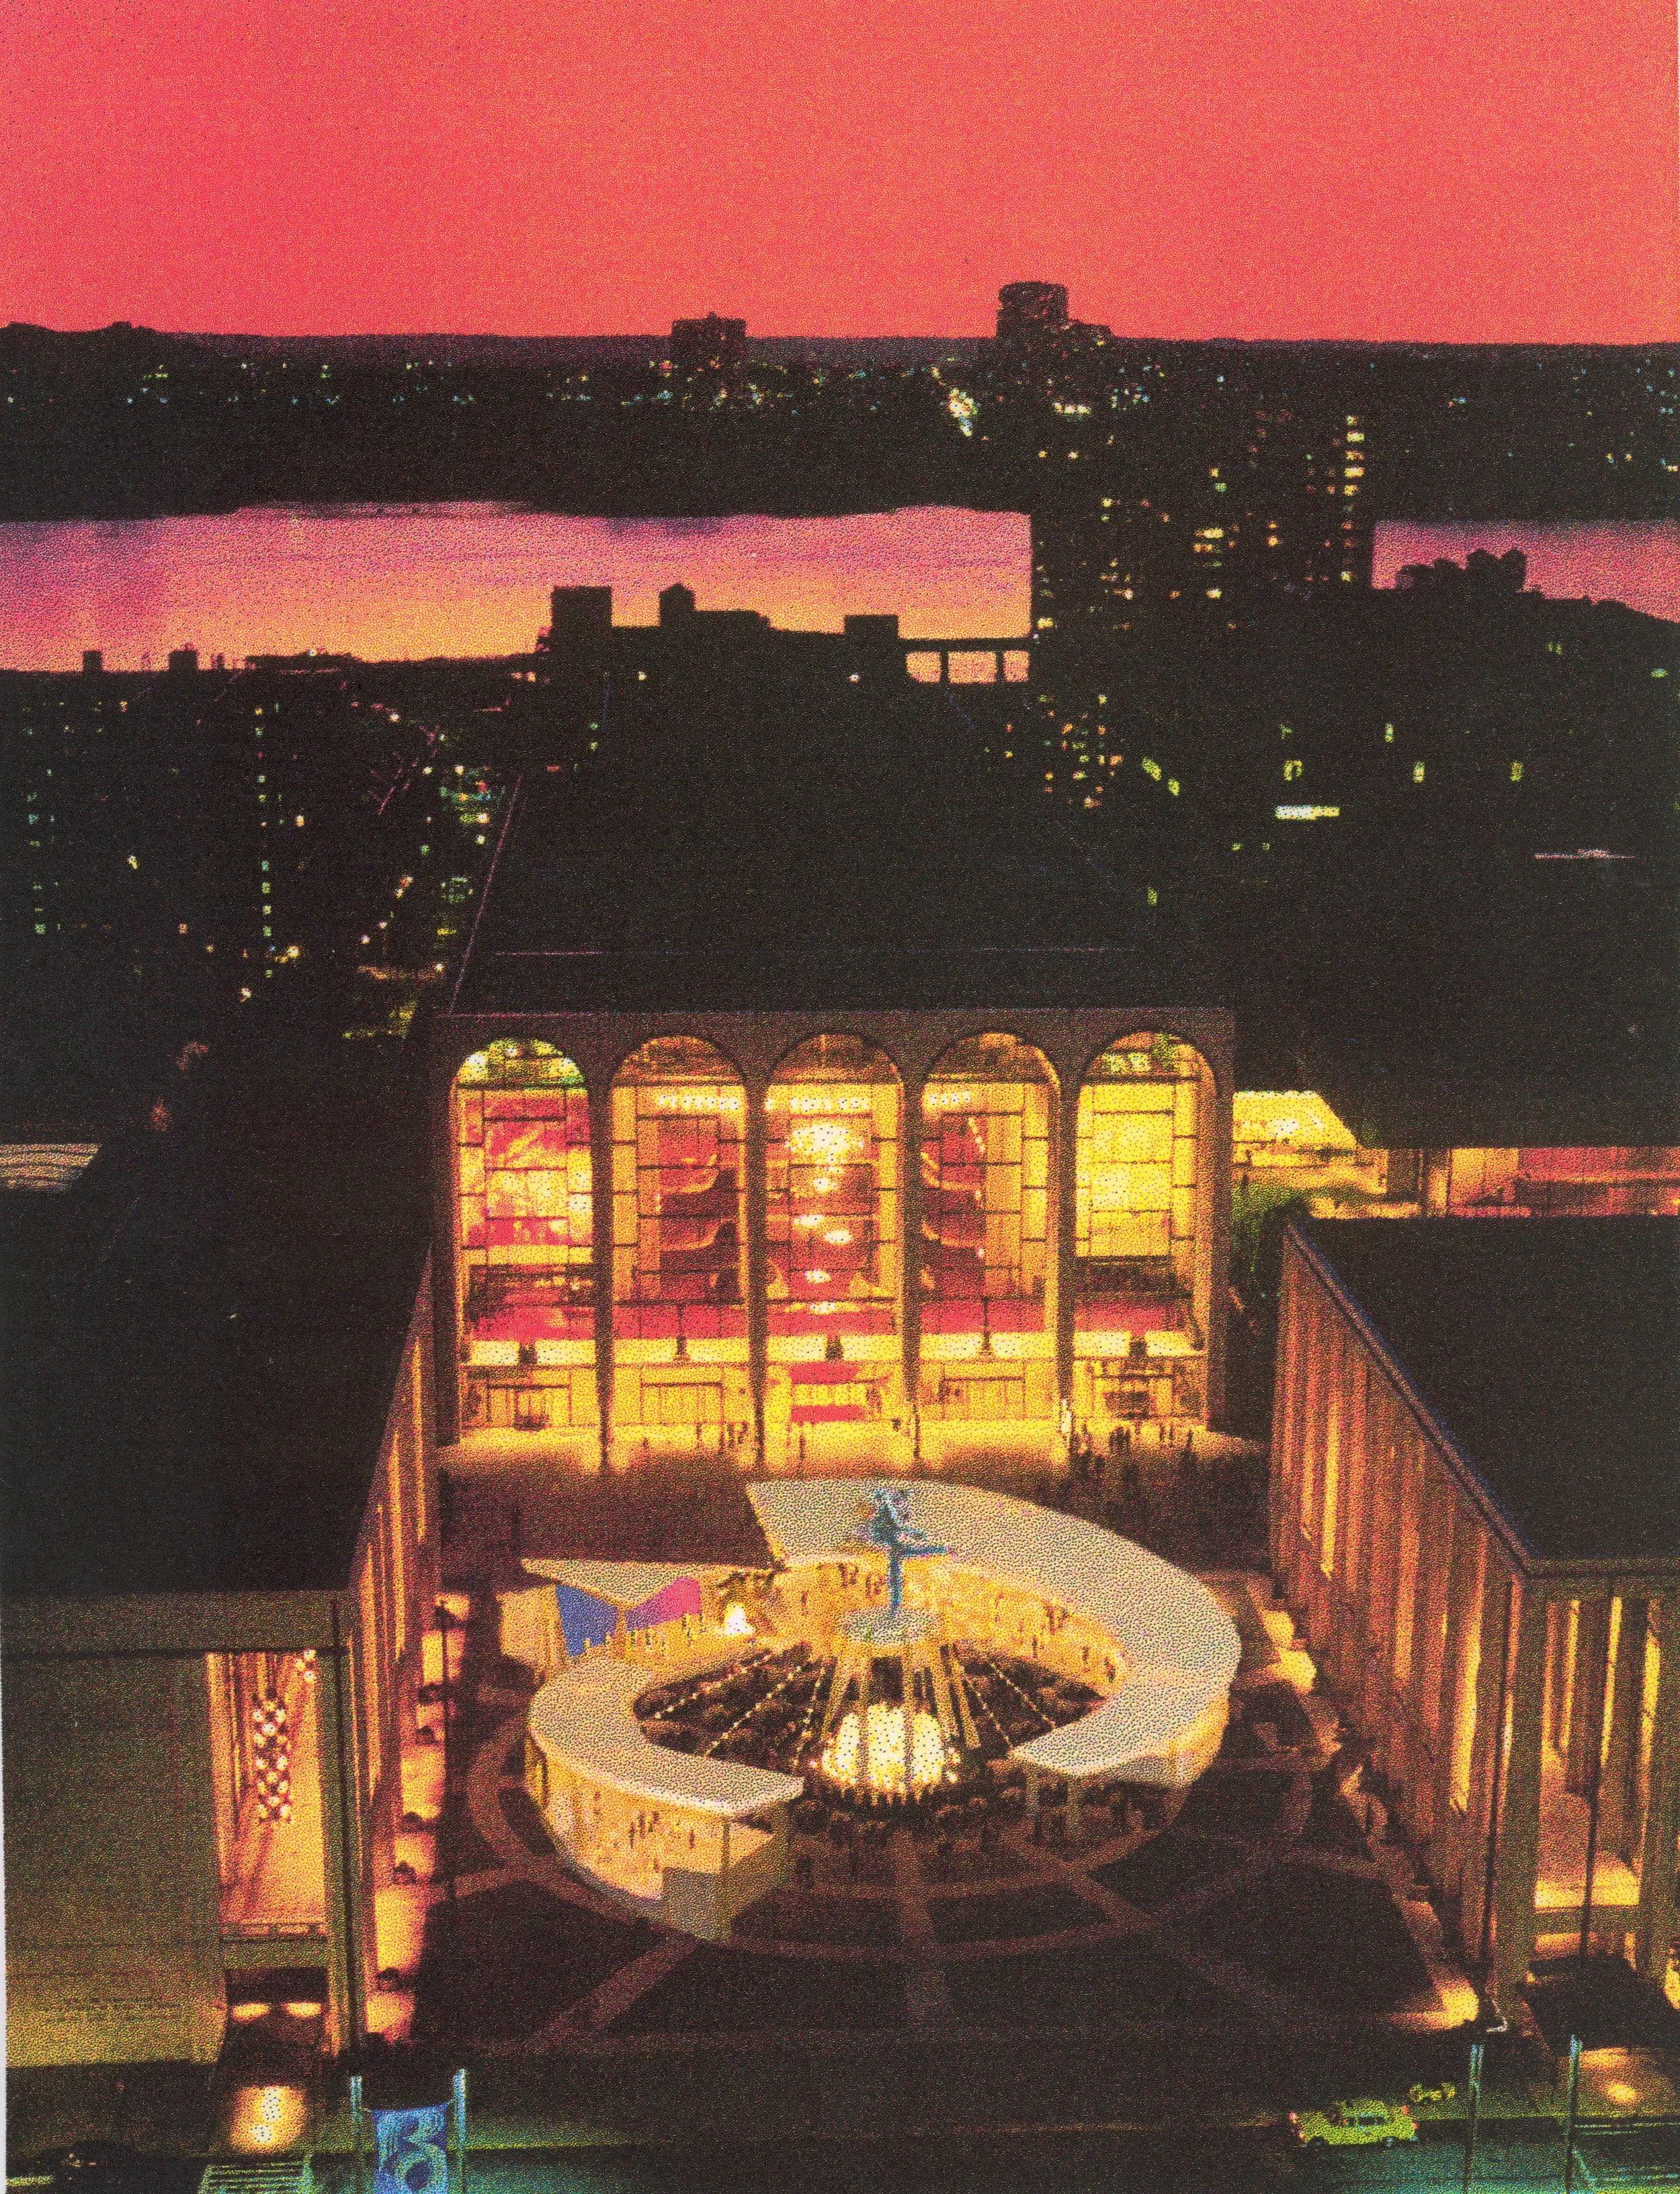 Lincoln-Center-Pavilions-Alan-Joslin-04.jpg